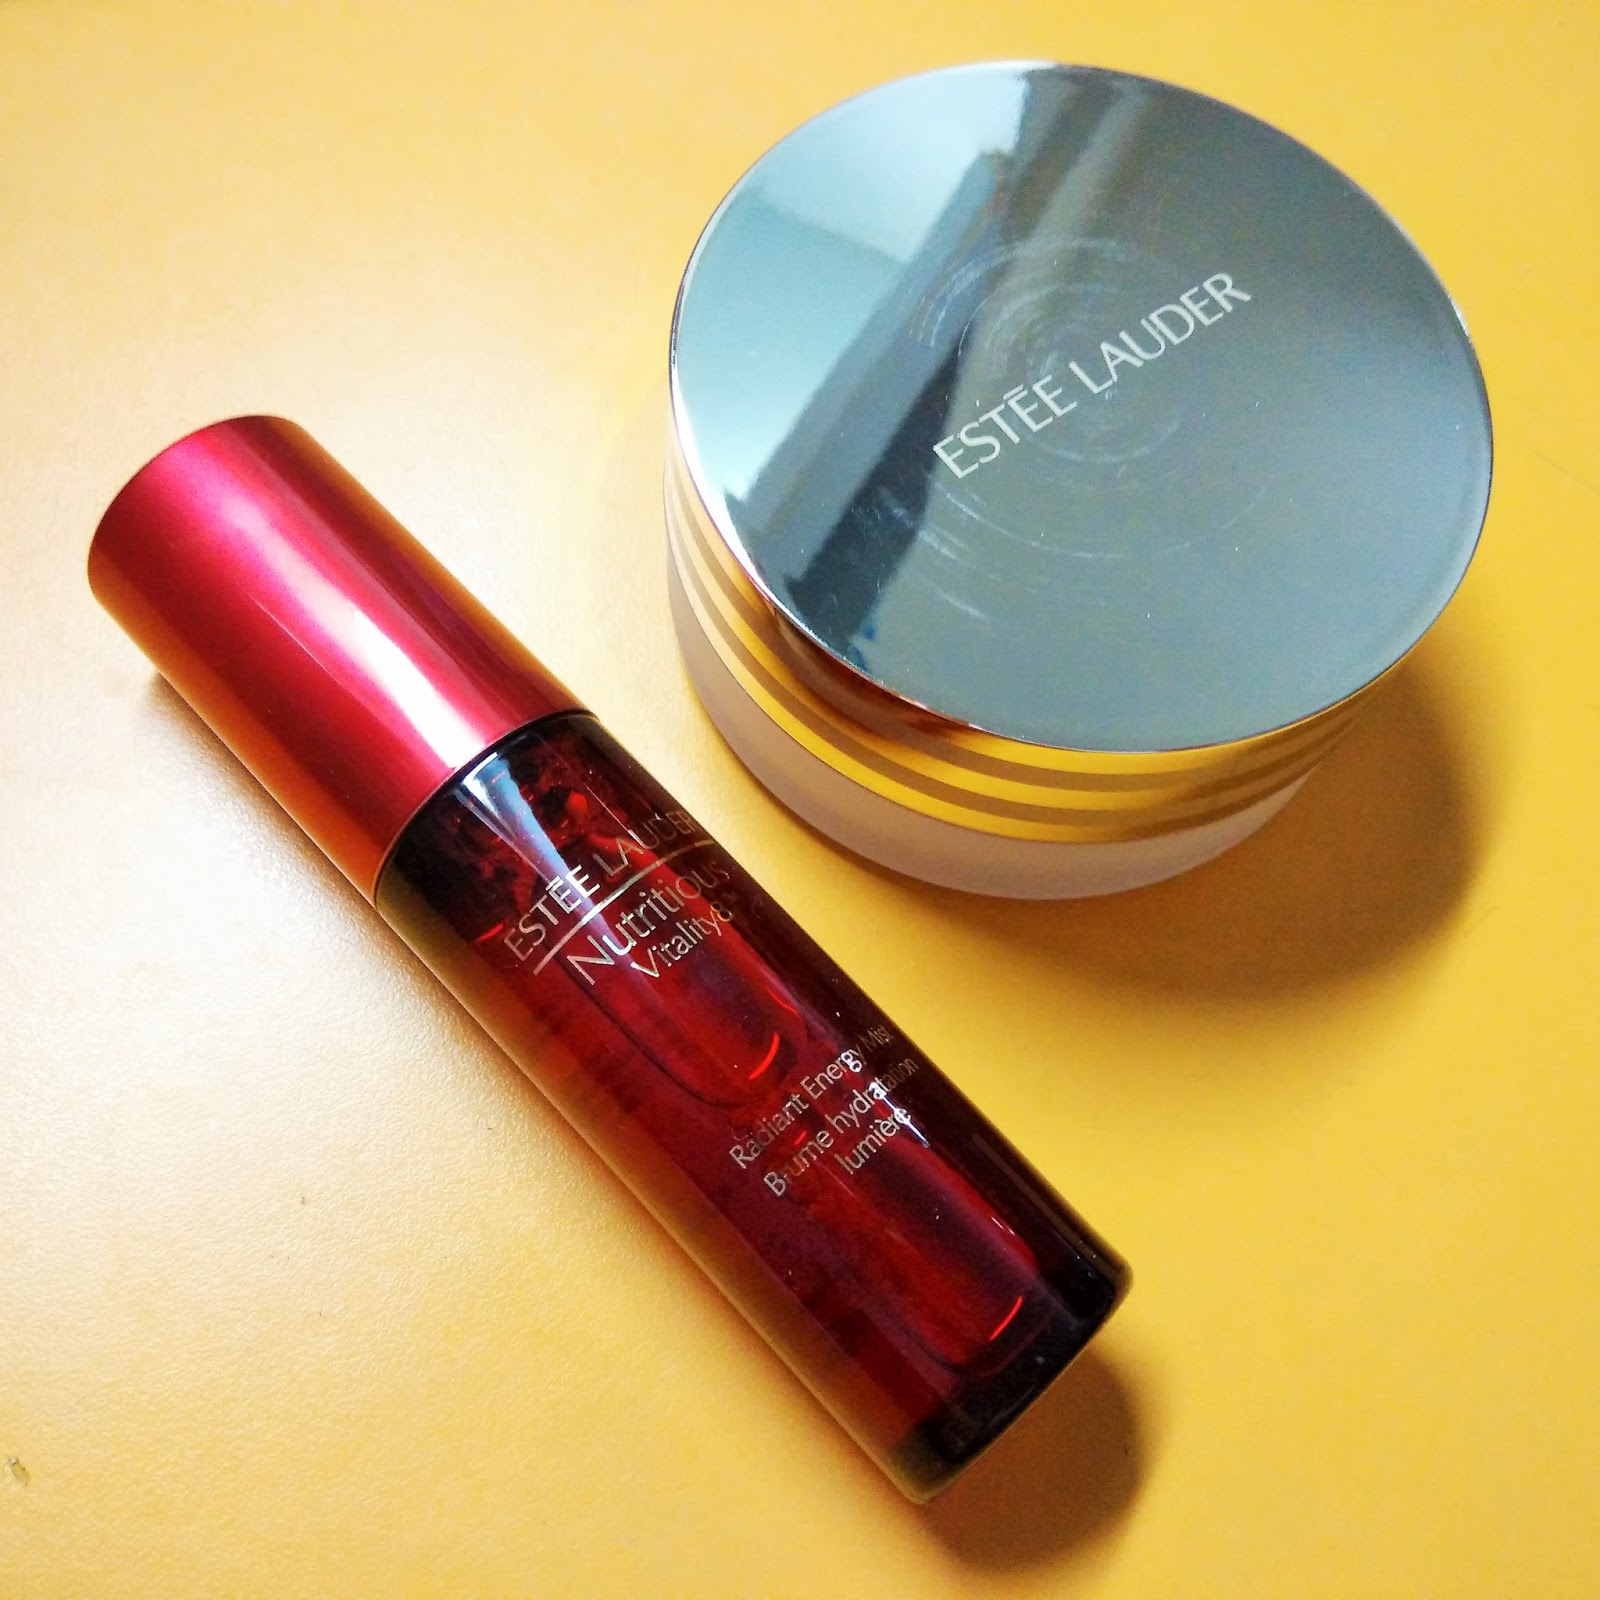 Advanced Night Micro Cleansing Balm by Estée Lauder #21